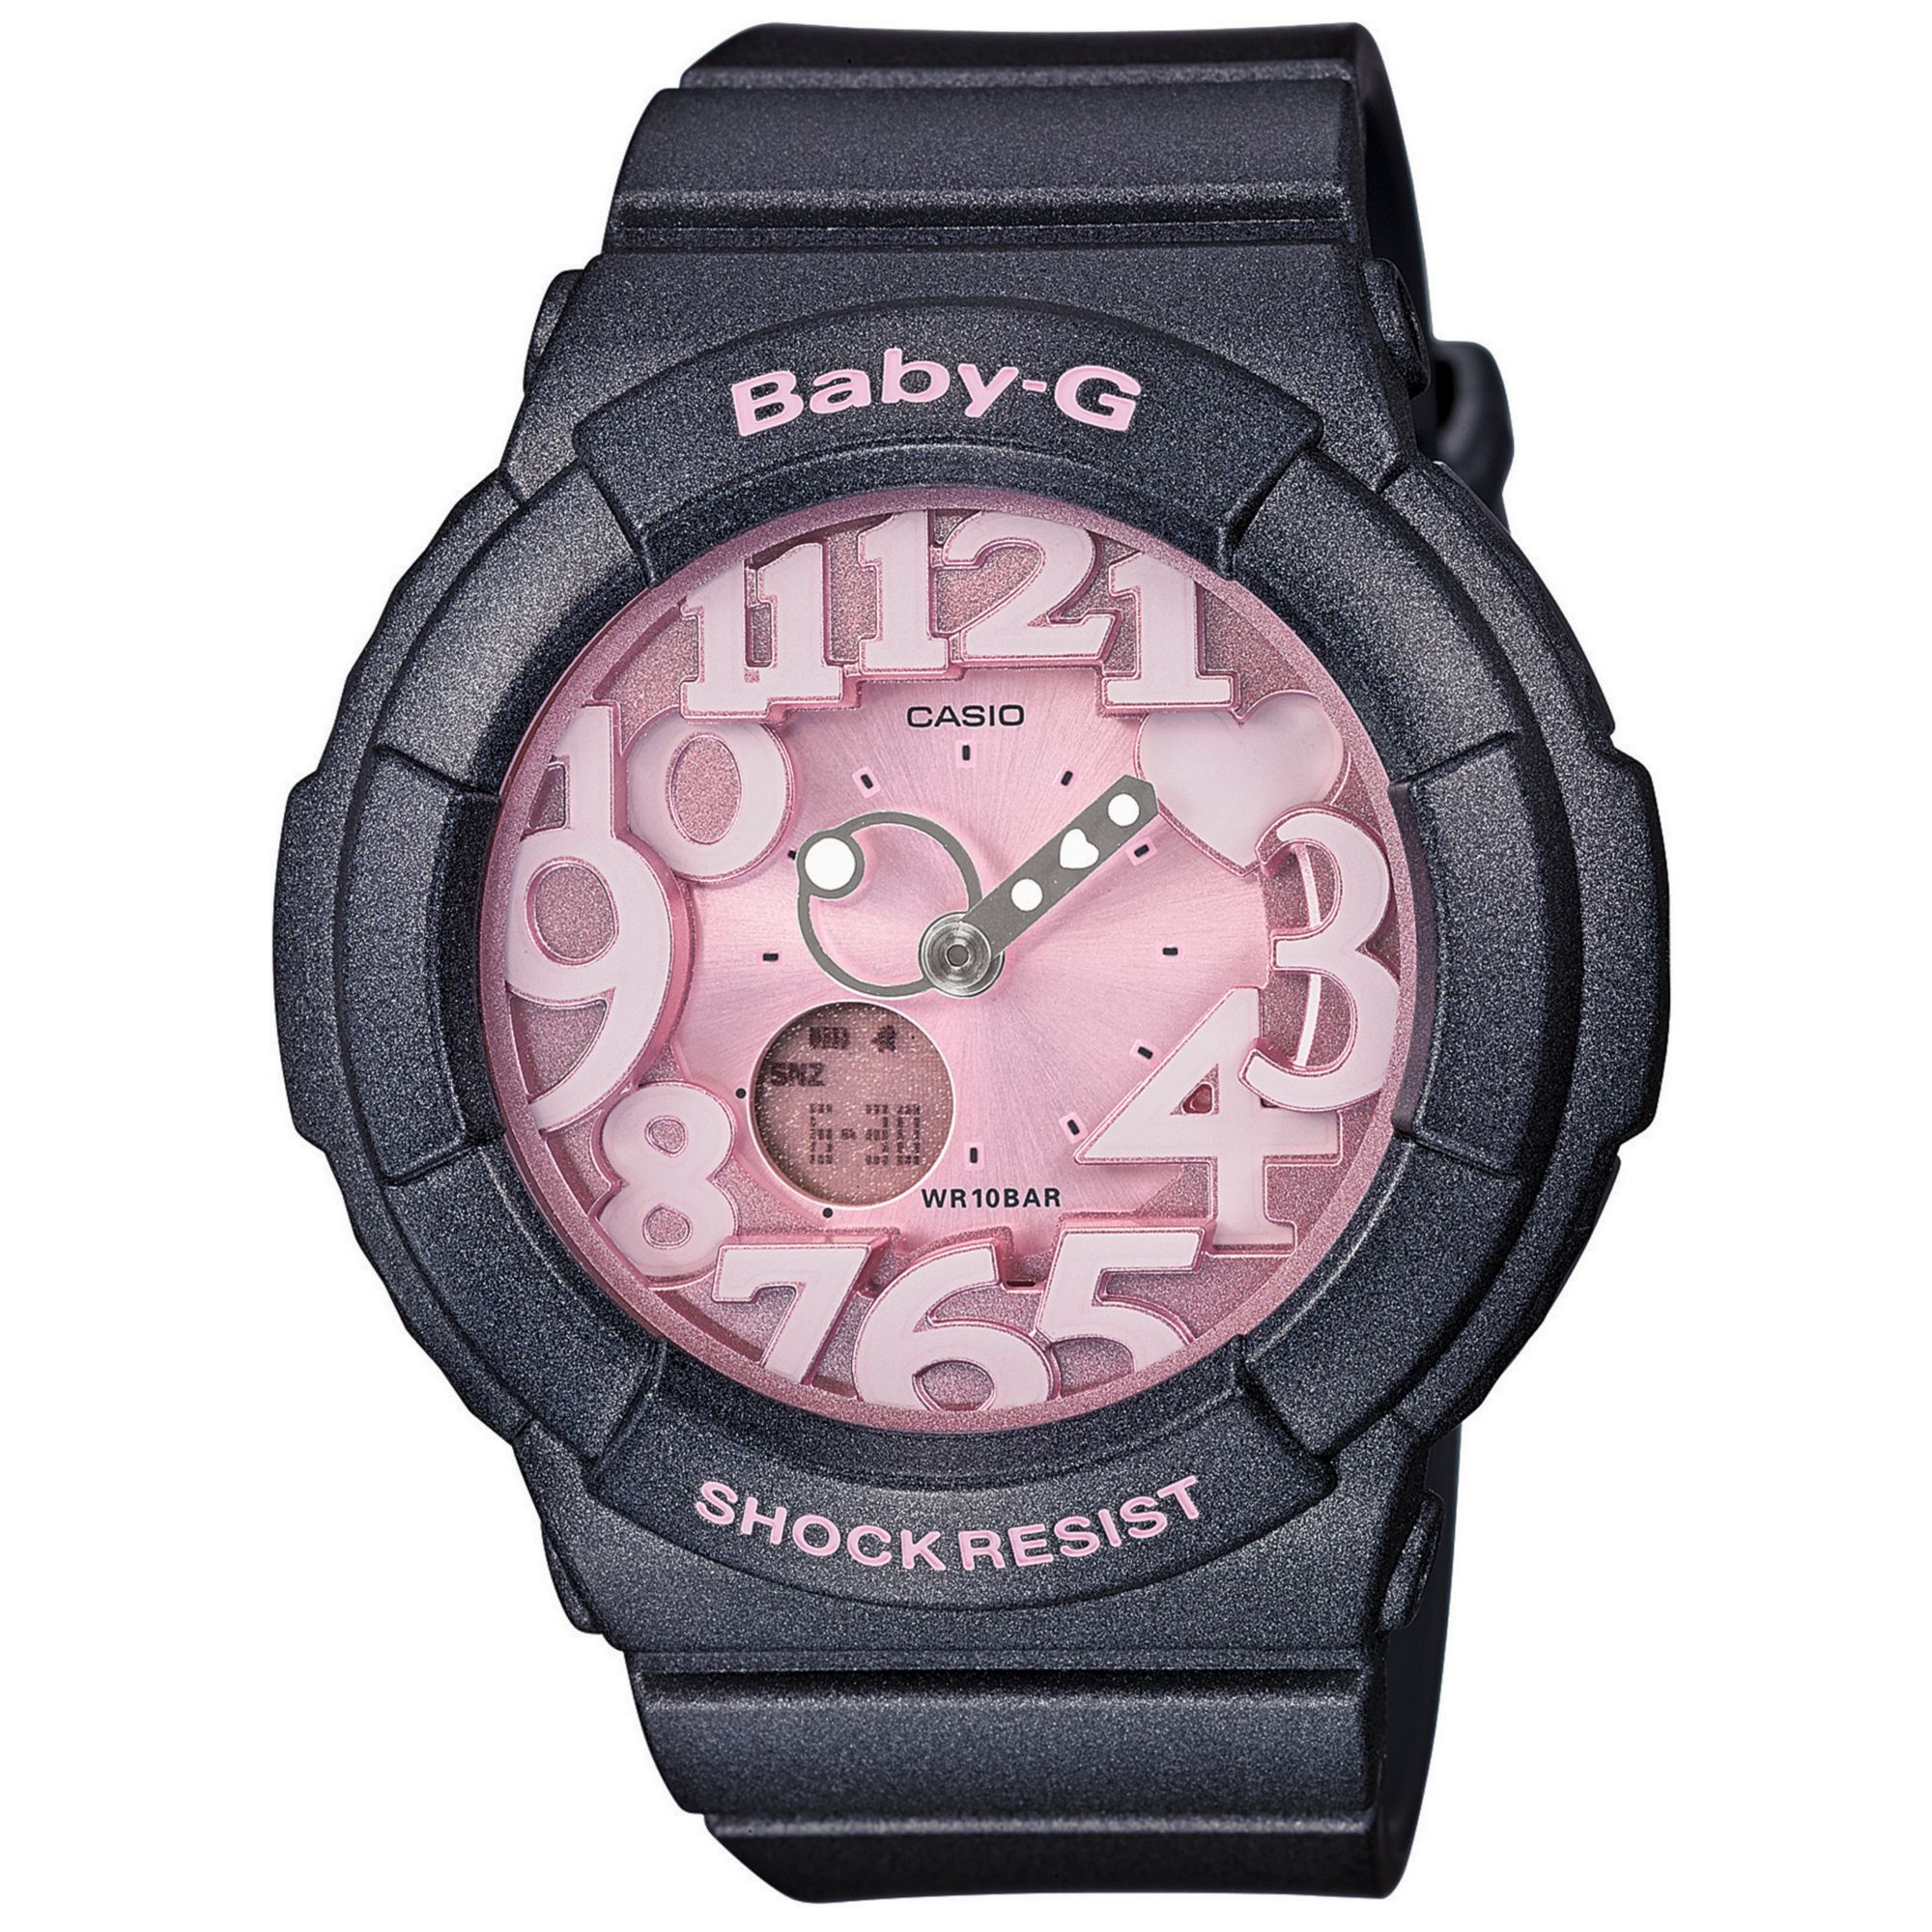 Lyst - G-Shock Babyg Womens Analogdigital Gray Resin Strap Watch ... 6d8b03e86f